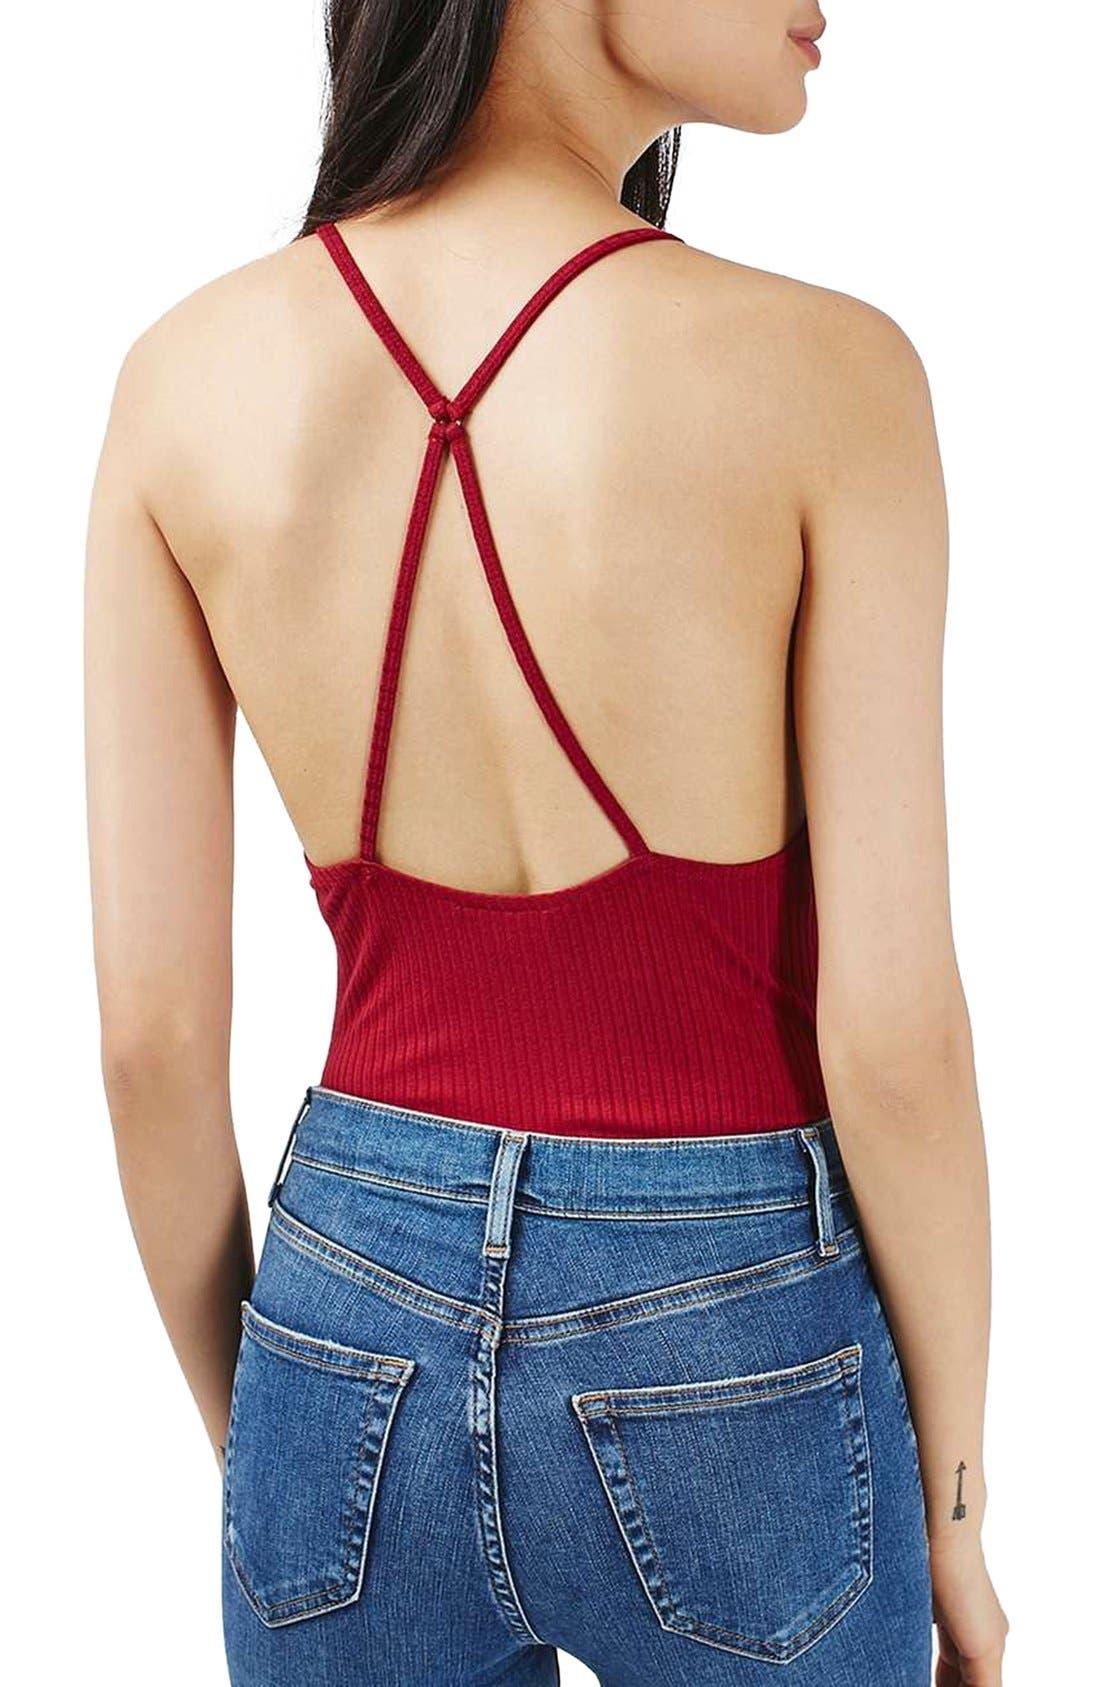 Alternate Image 2  - Topshp Cross Back Plunge Bodysuit (Petite)